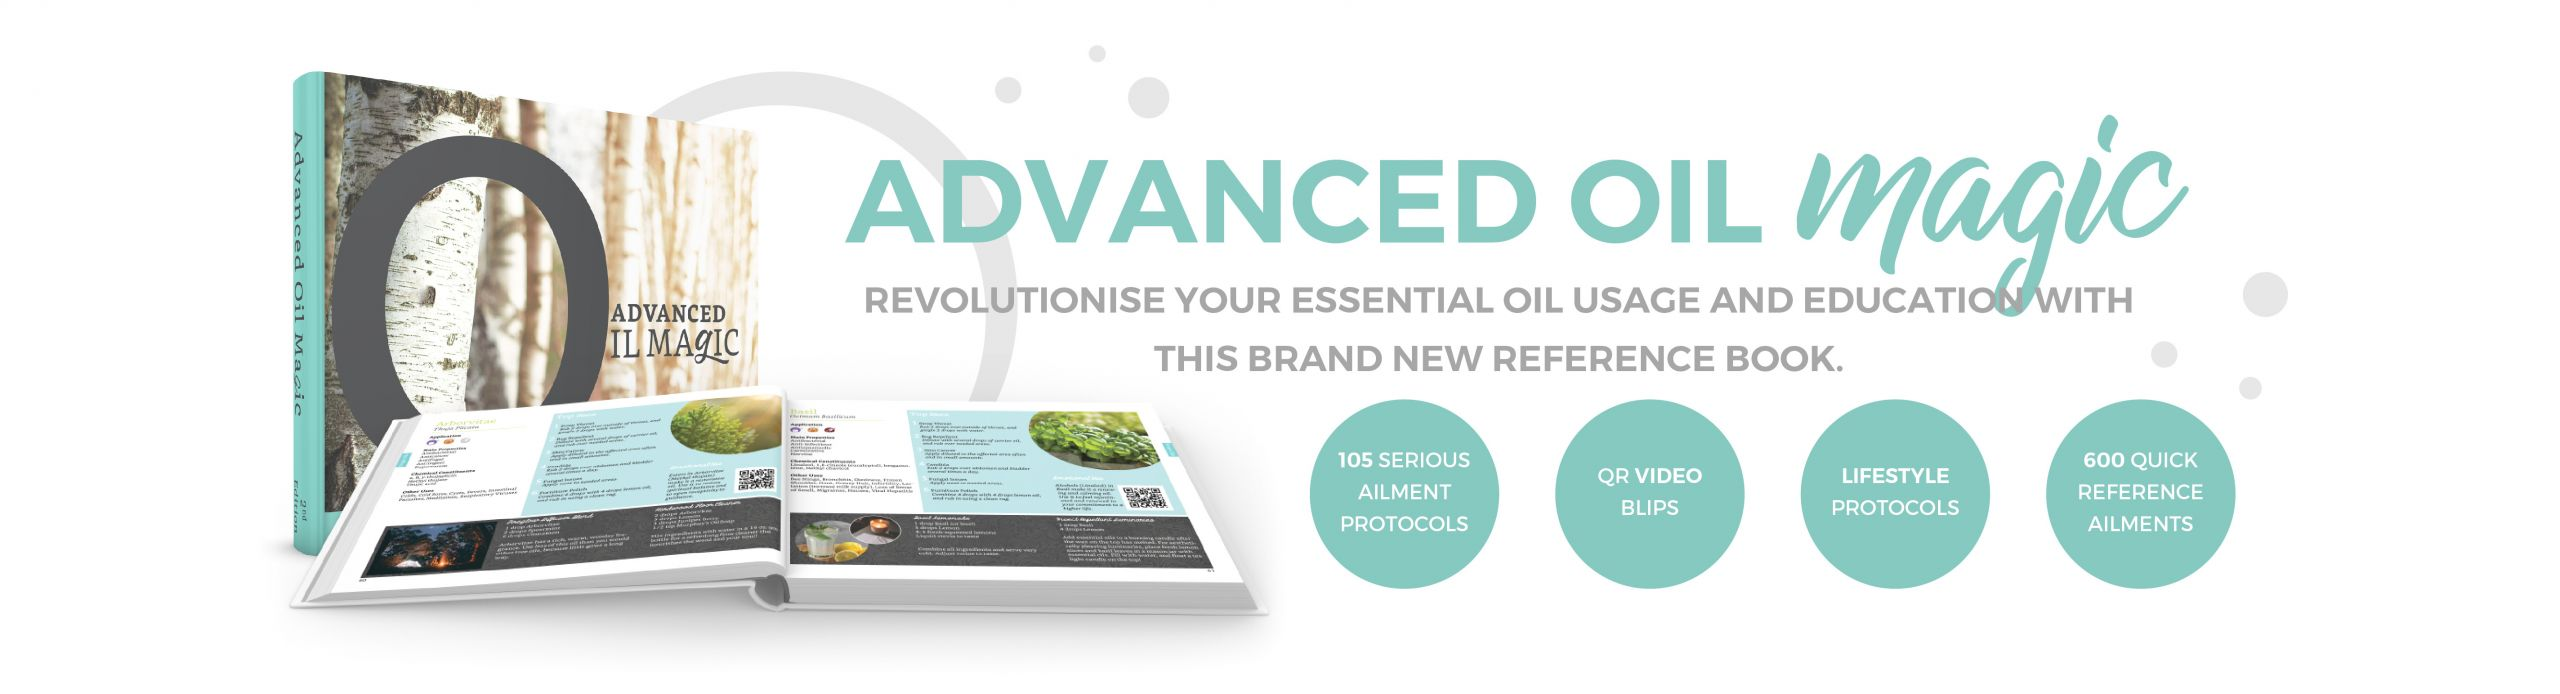 advanced oil magic web graphic jpg